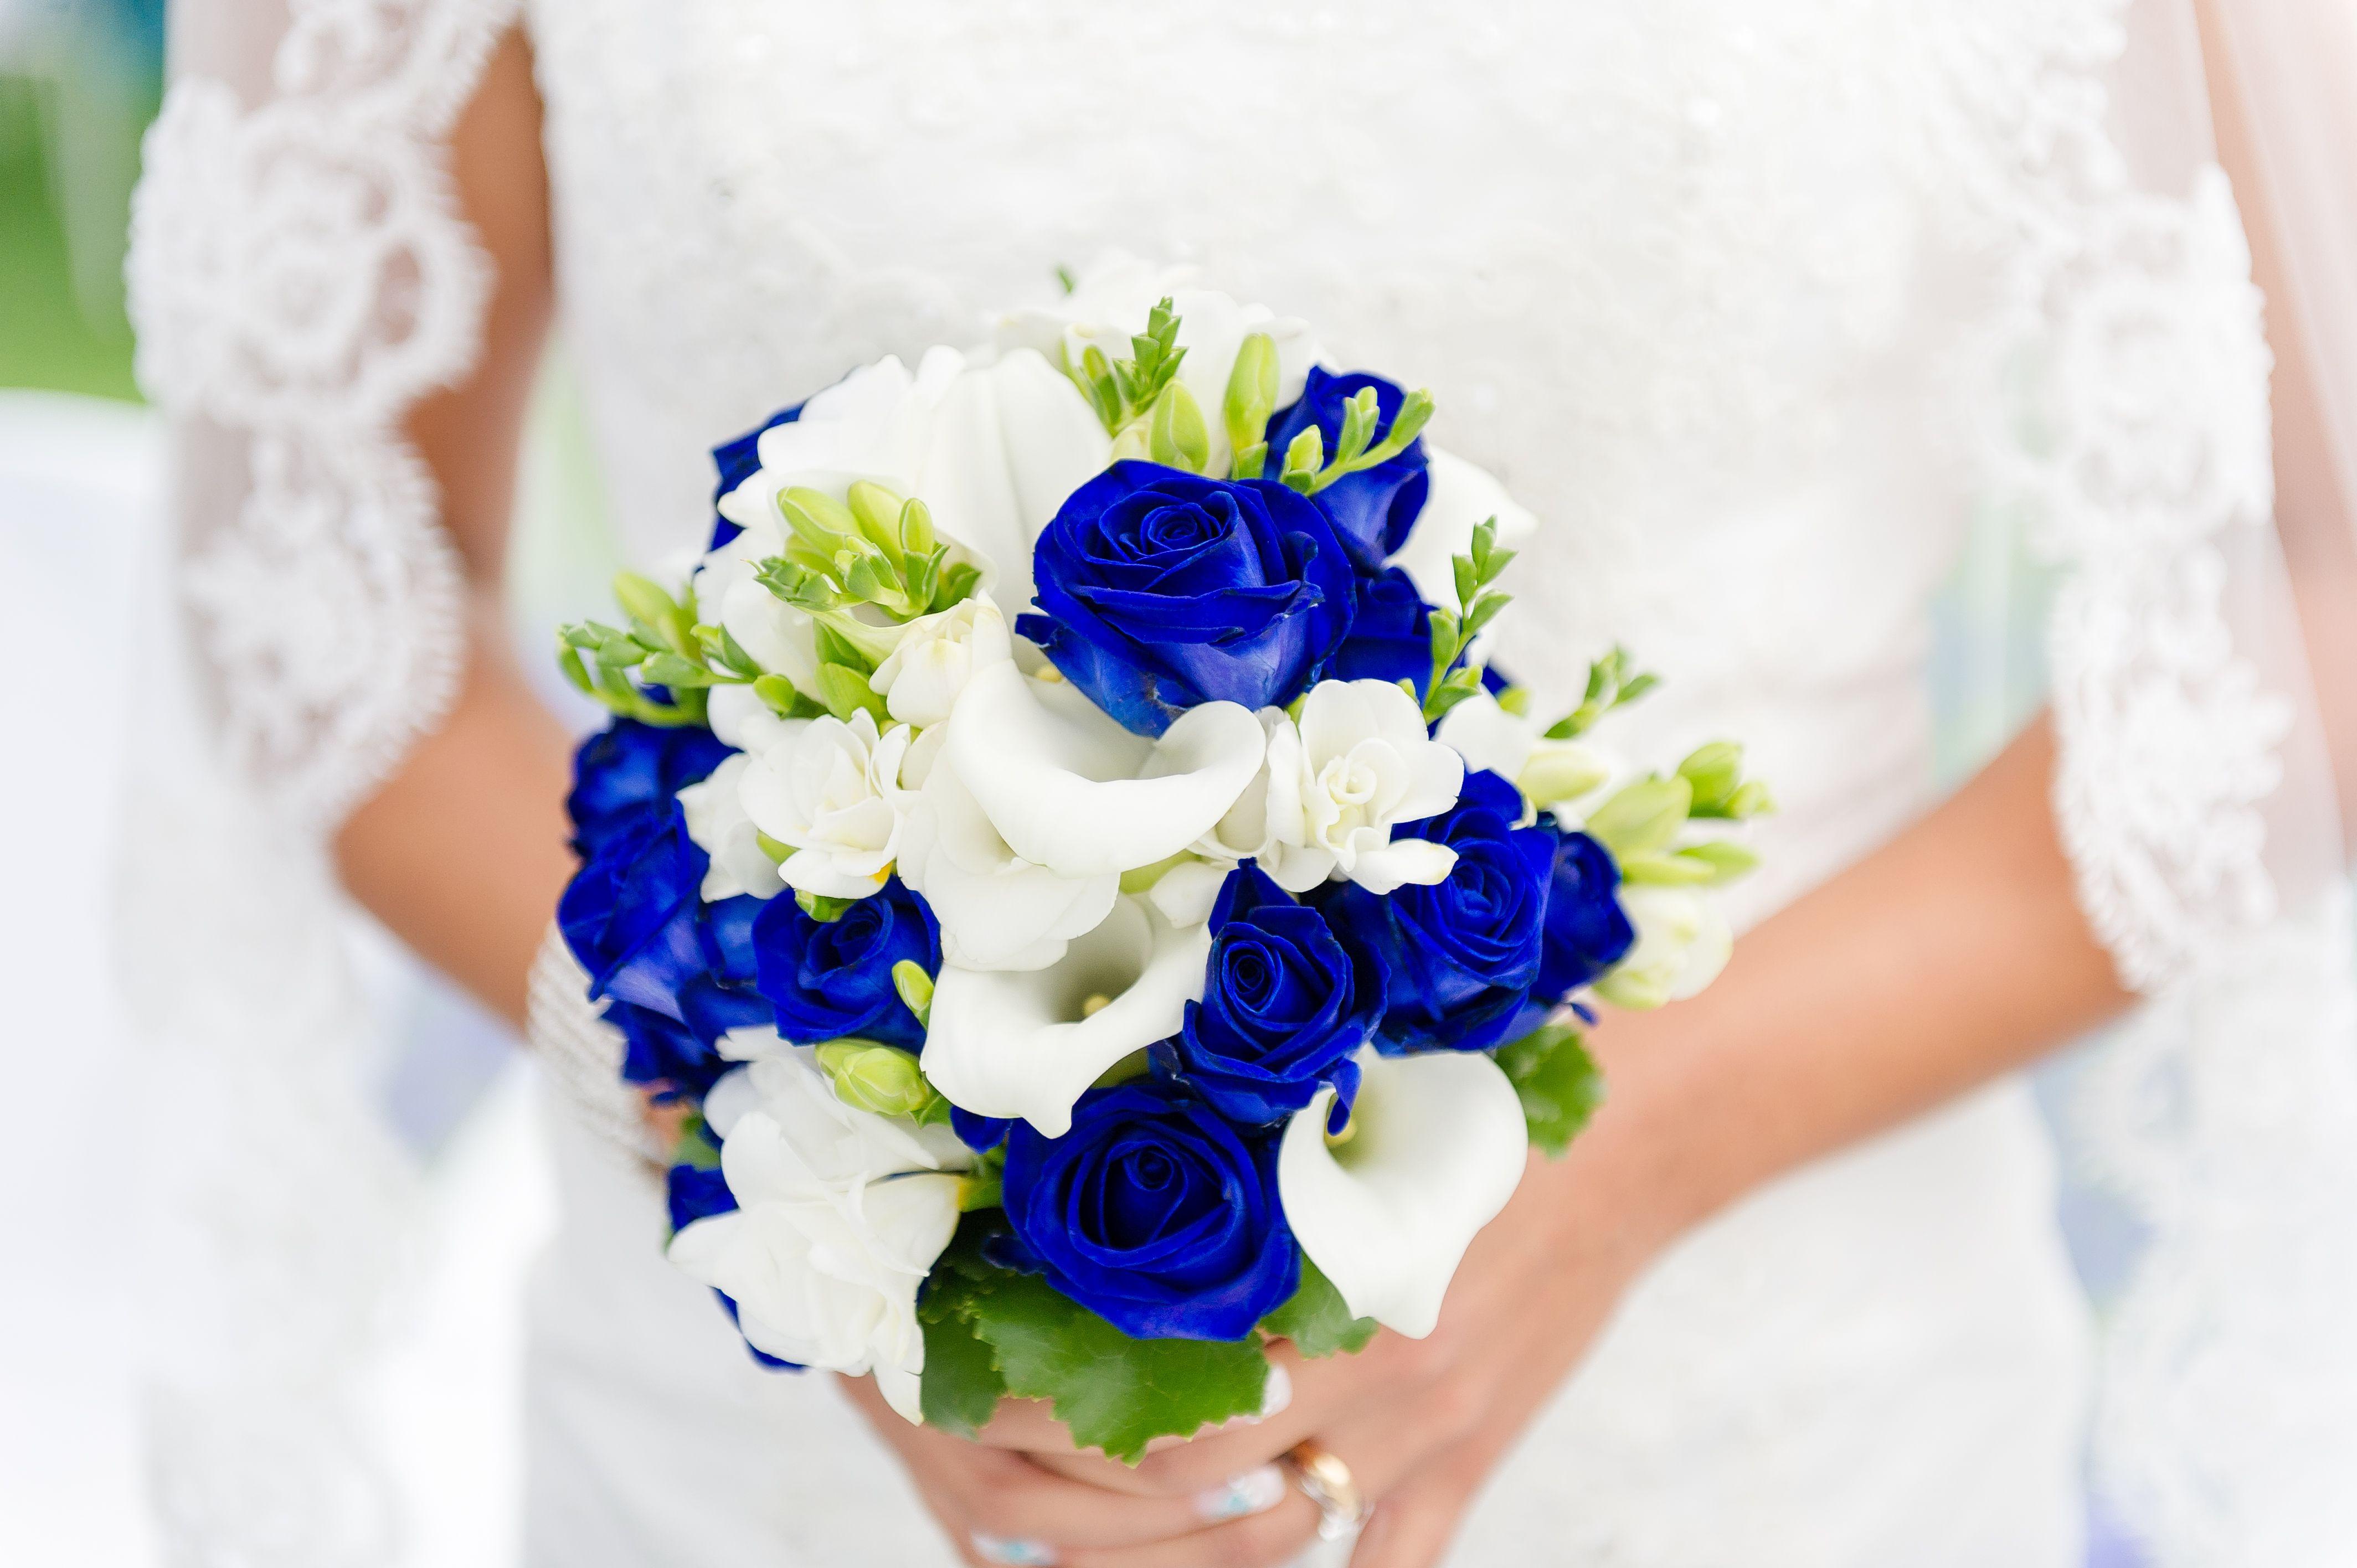 Bouquet Sposa 2018 Blu.Rose Blu Assieme A Calle Bianche Creano Un Bouquet Fantastico